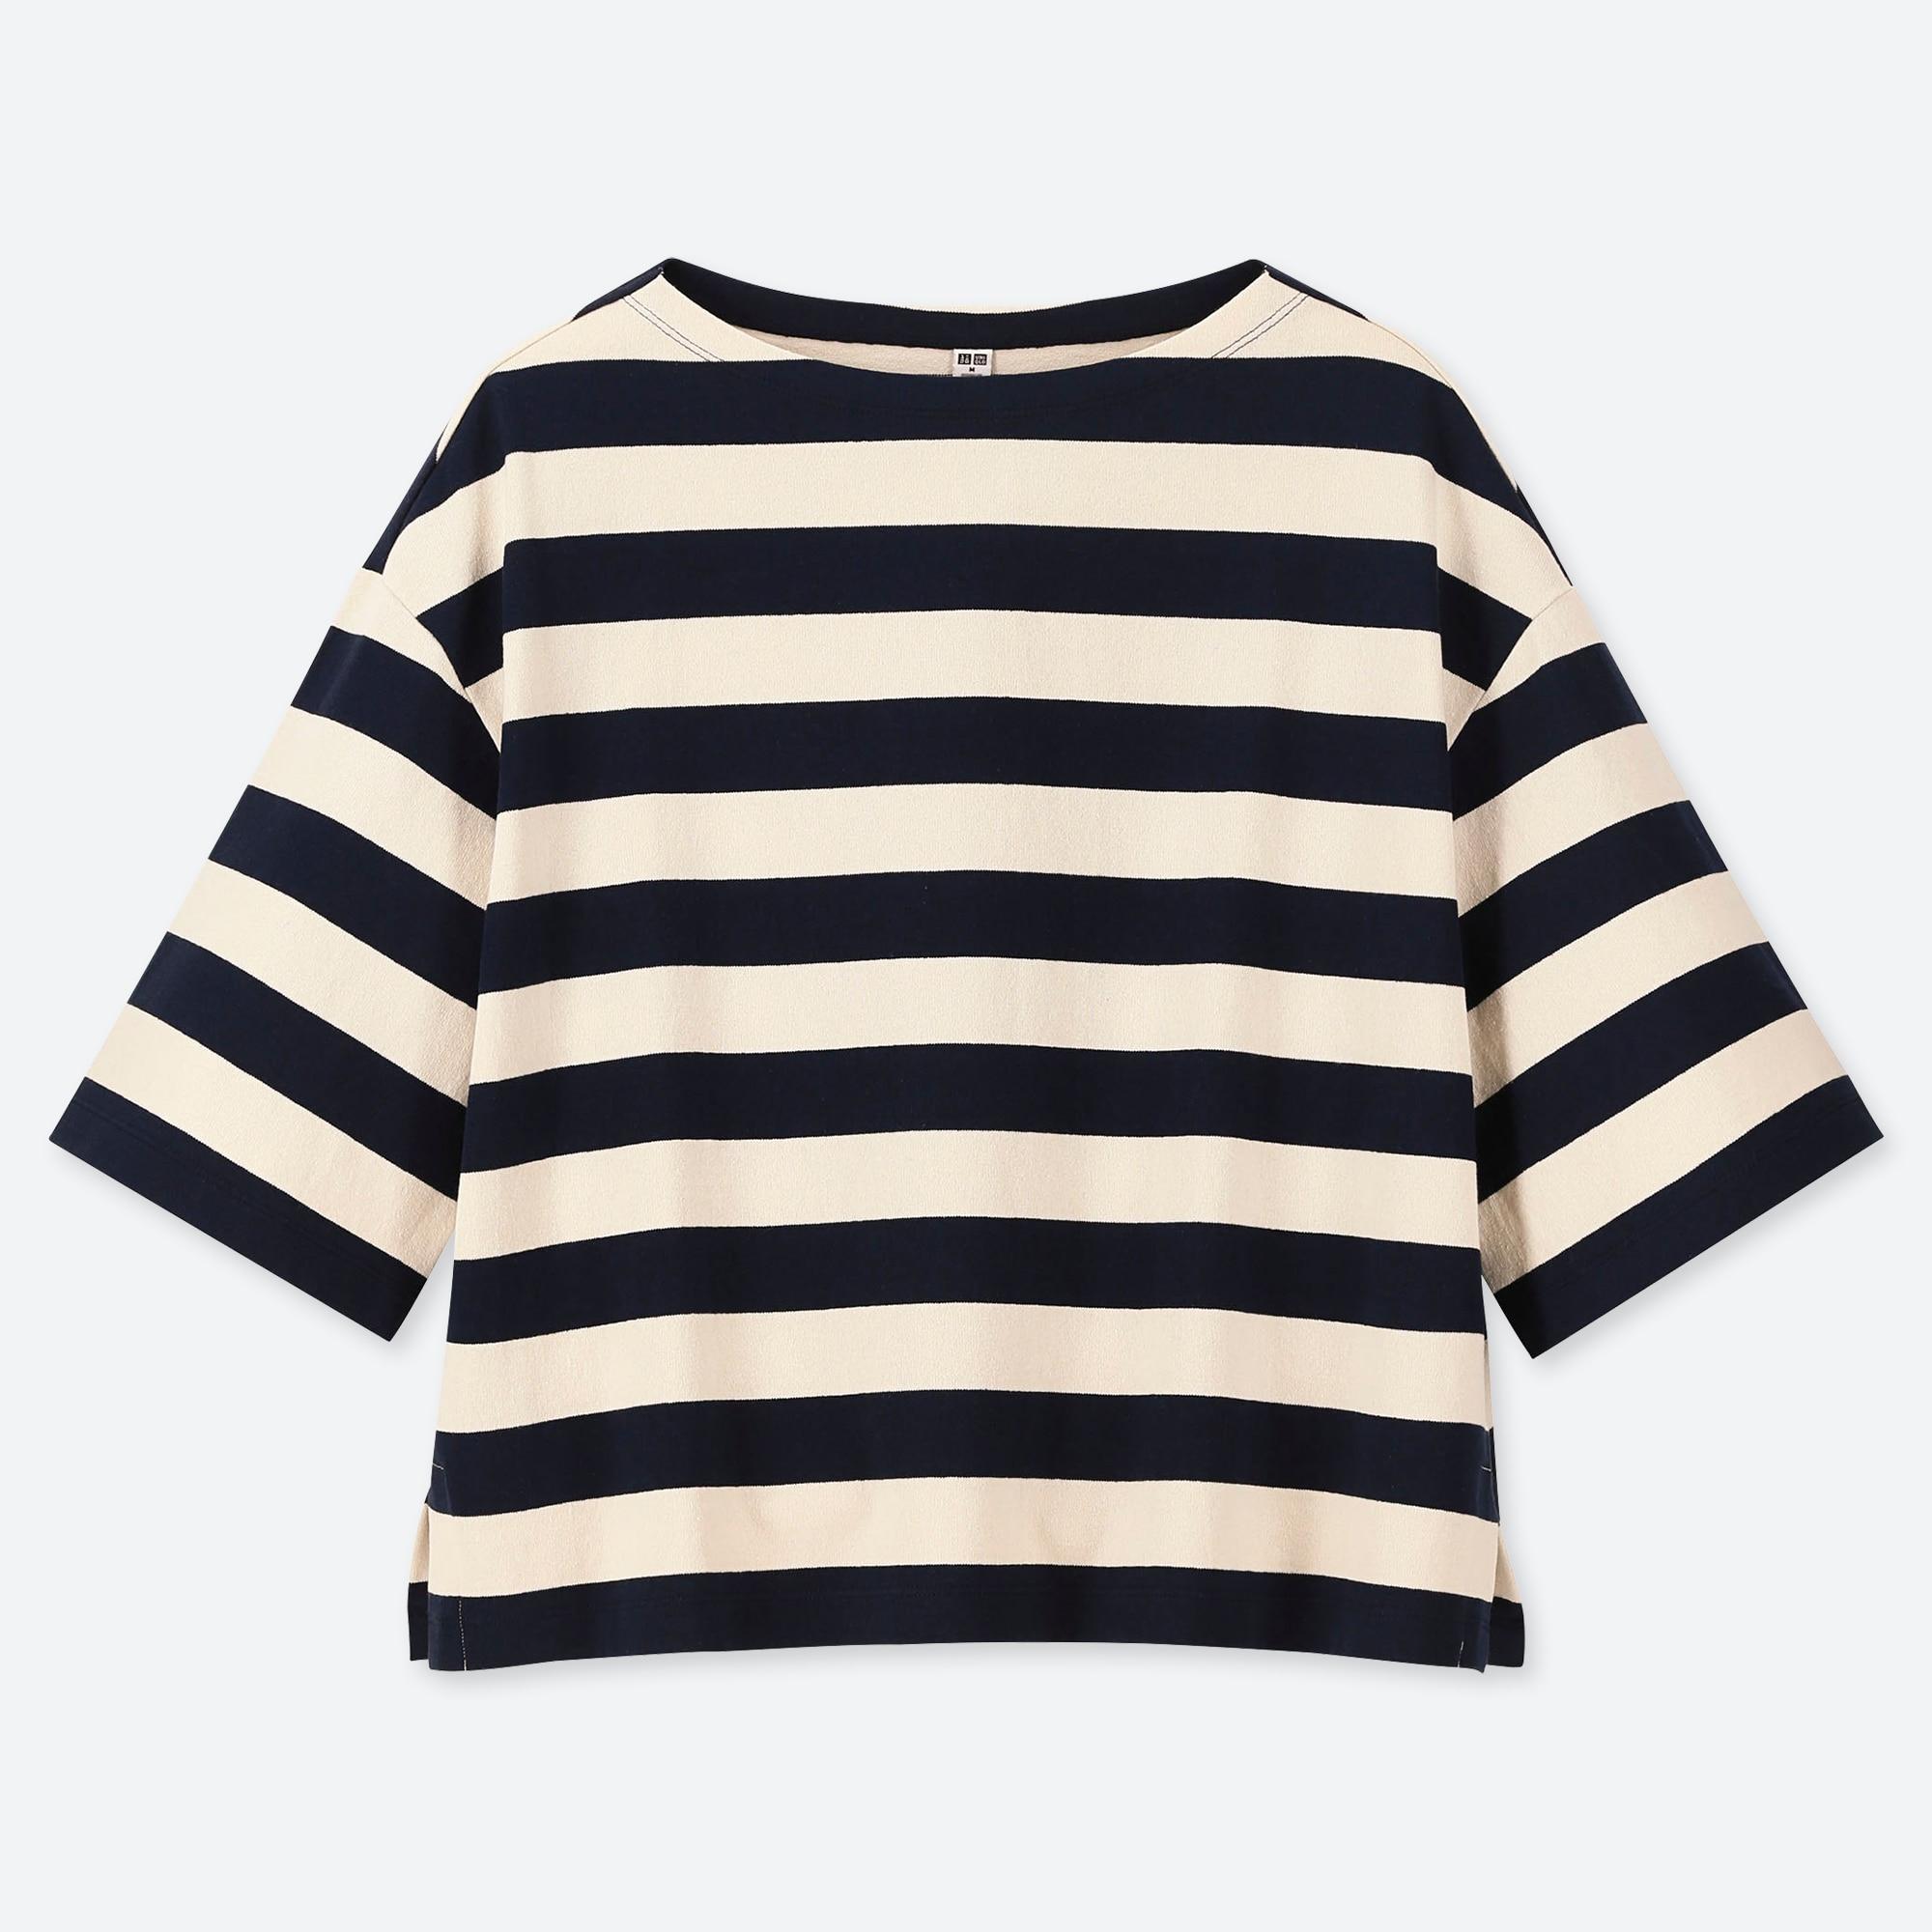 Womens Ladies new cotton large stripe T-shirt womens shortsleeve top.Size:S.M.L.